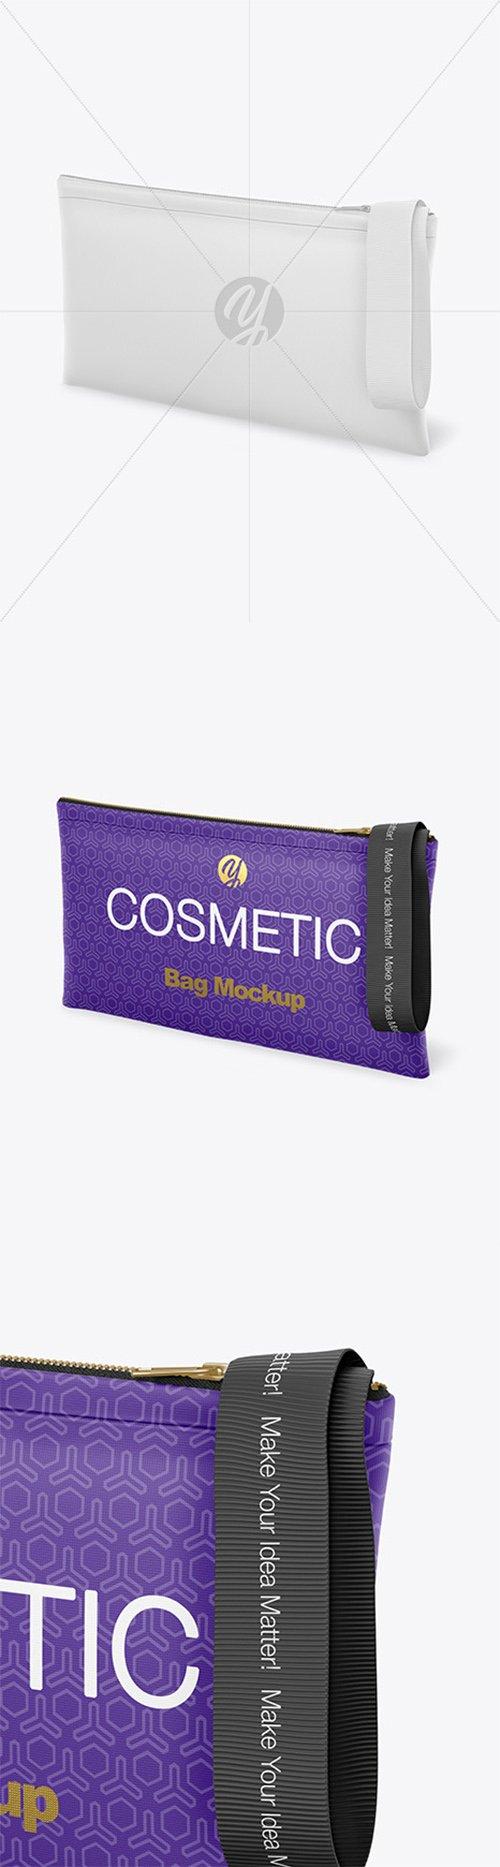 Cosmetic Bag Mockup 65371